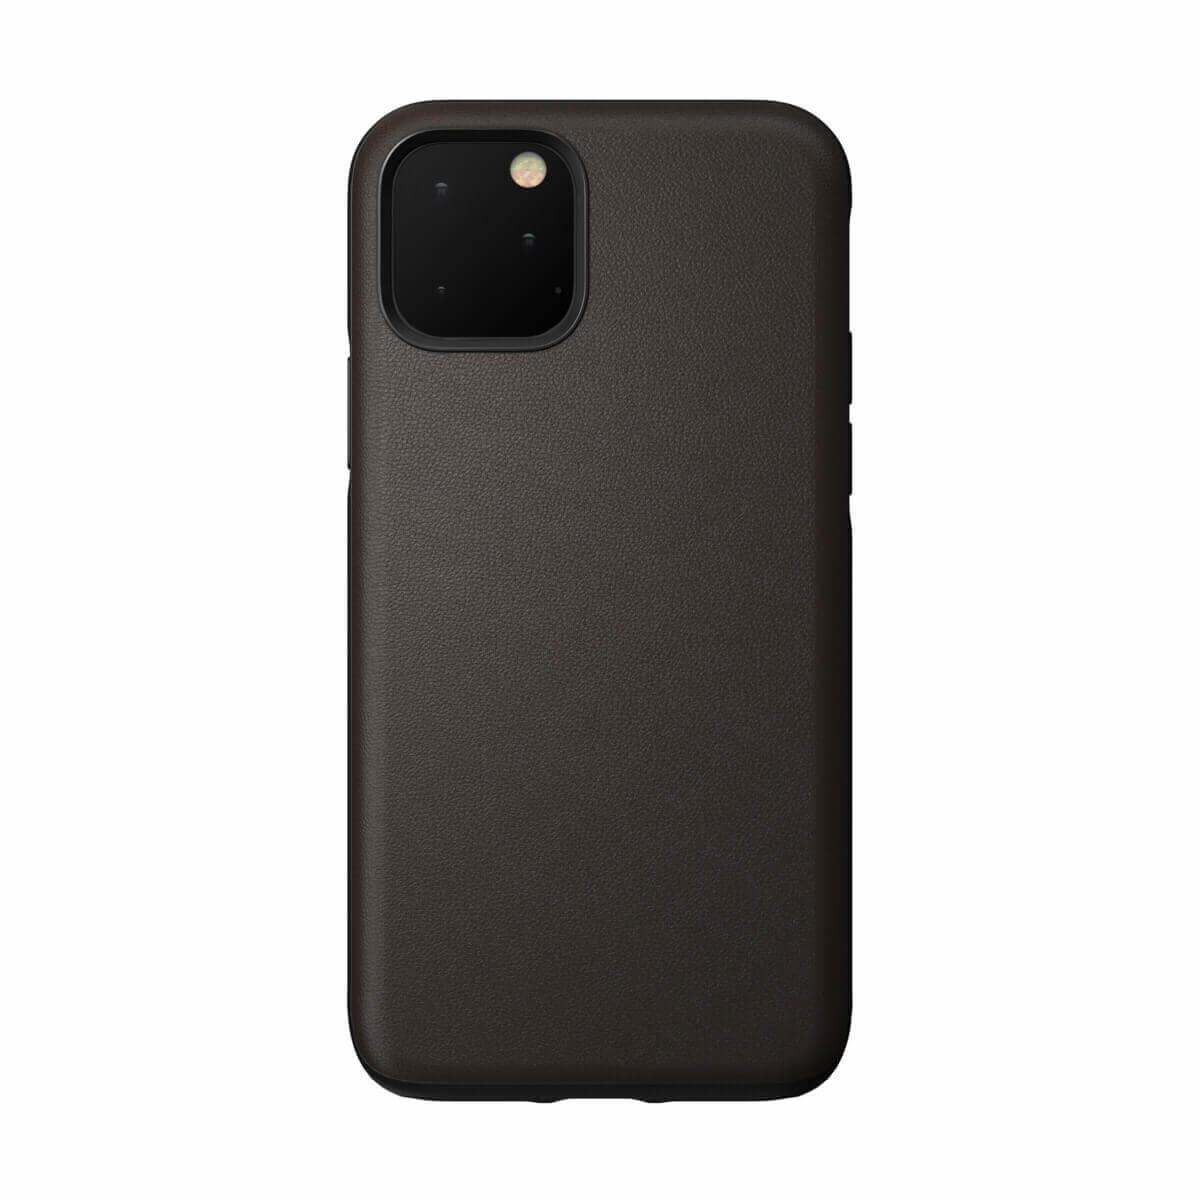 Nomad Leather Rugged Waterproof Case — кожен (естествена кожа) кейс за iPhone 11 Pro Max (кафяв) - 2